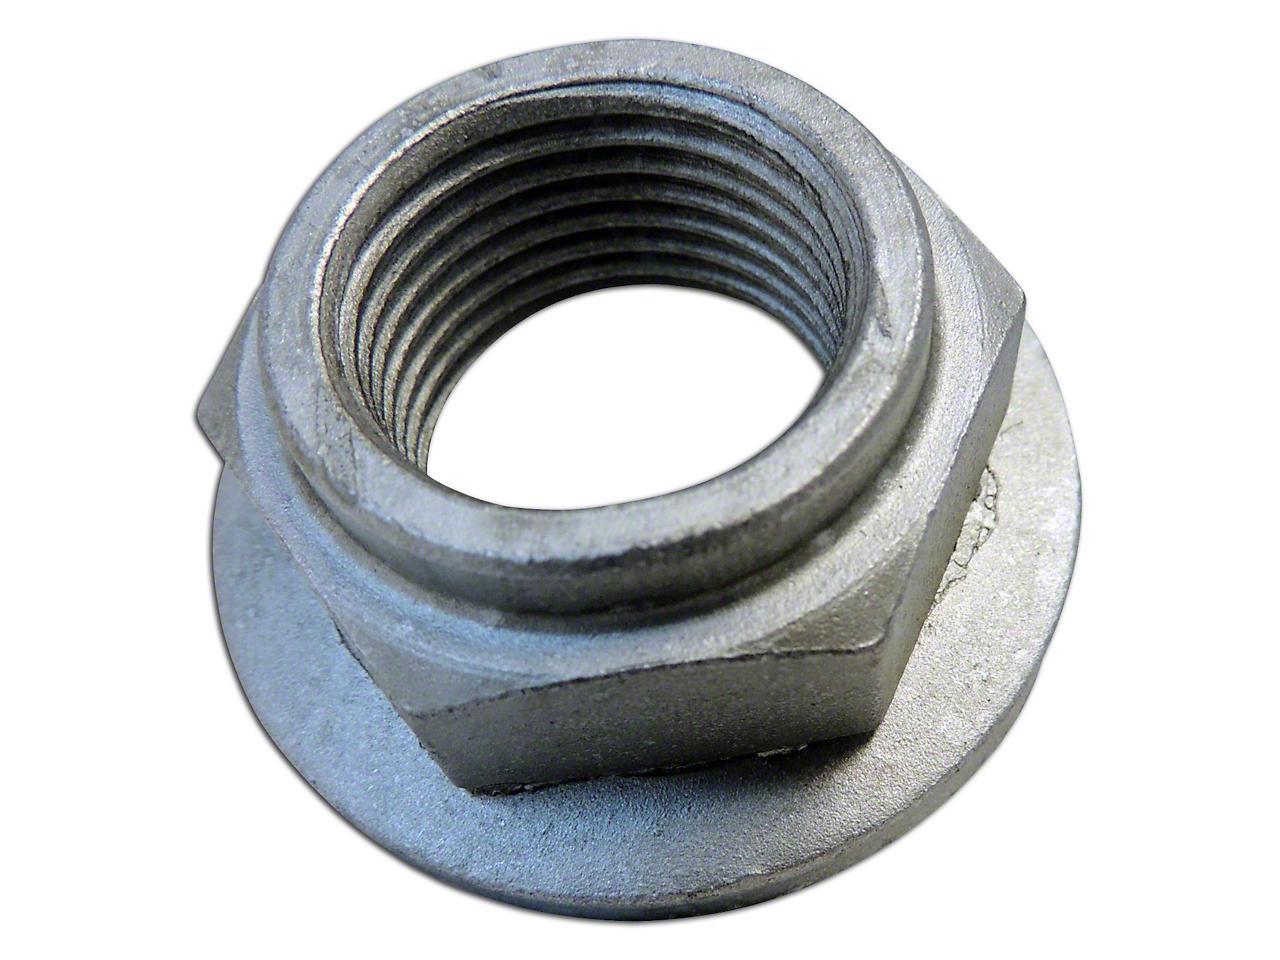 Dana 30/44 Front Axle Shaft Nut (07-18 Jeep Wrangler JK)